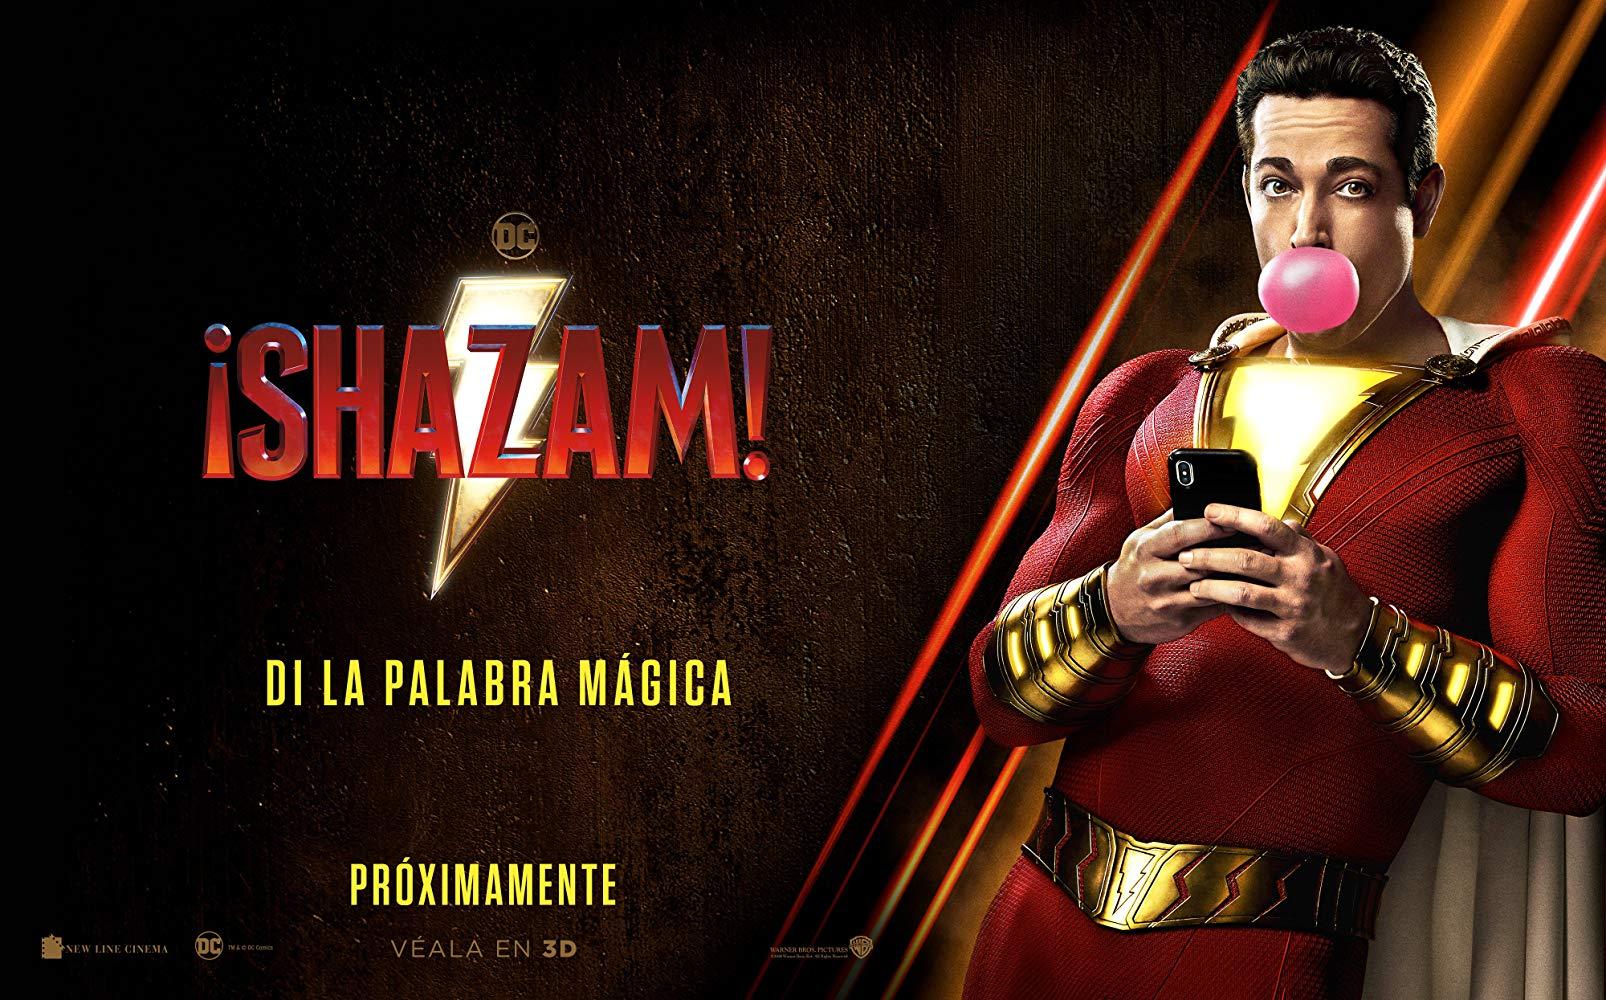 shazam - THOR vs SHAZAM is Trending! Who Wins This Fight?